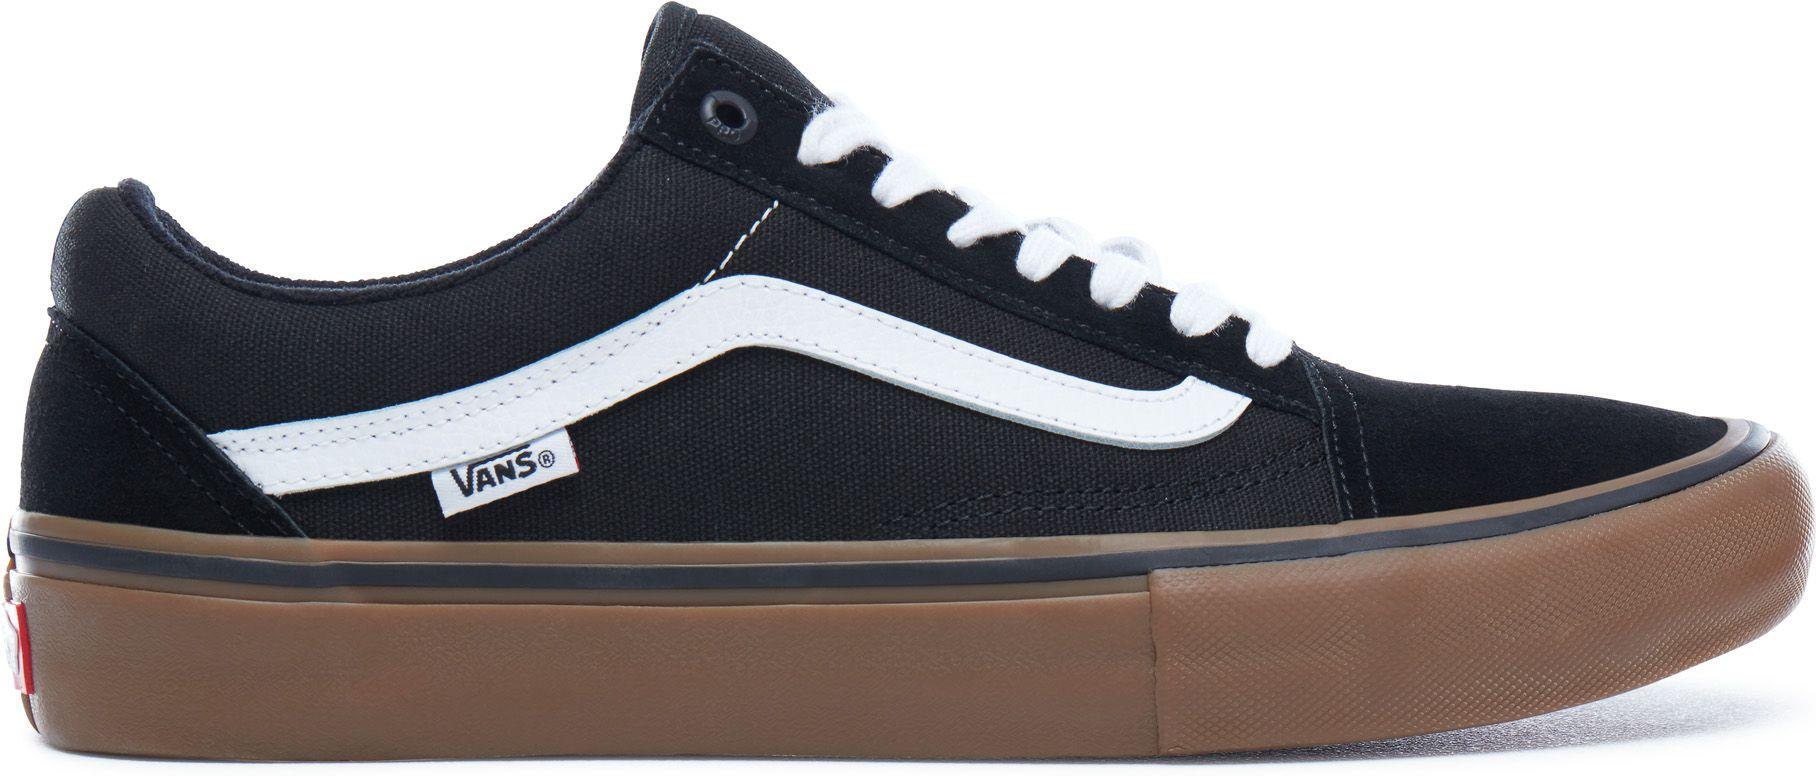 f40e5e9a4fd pánske topánky vans OLD SKOOL PRO Black White Gum